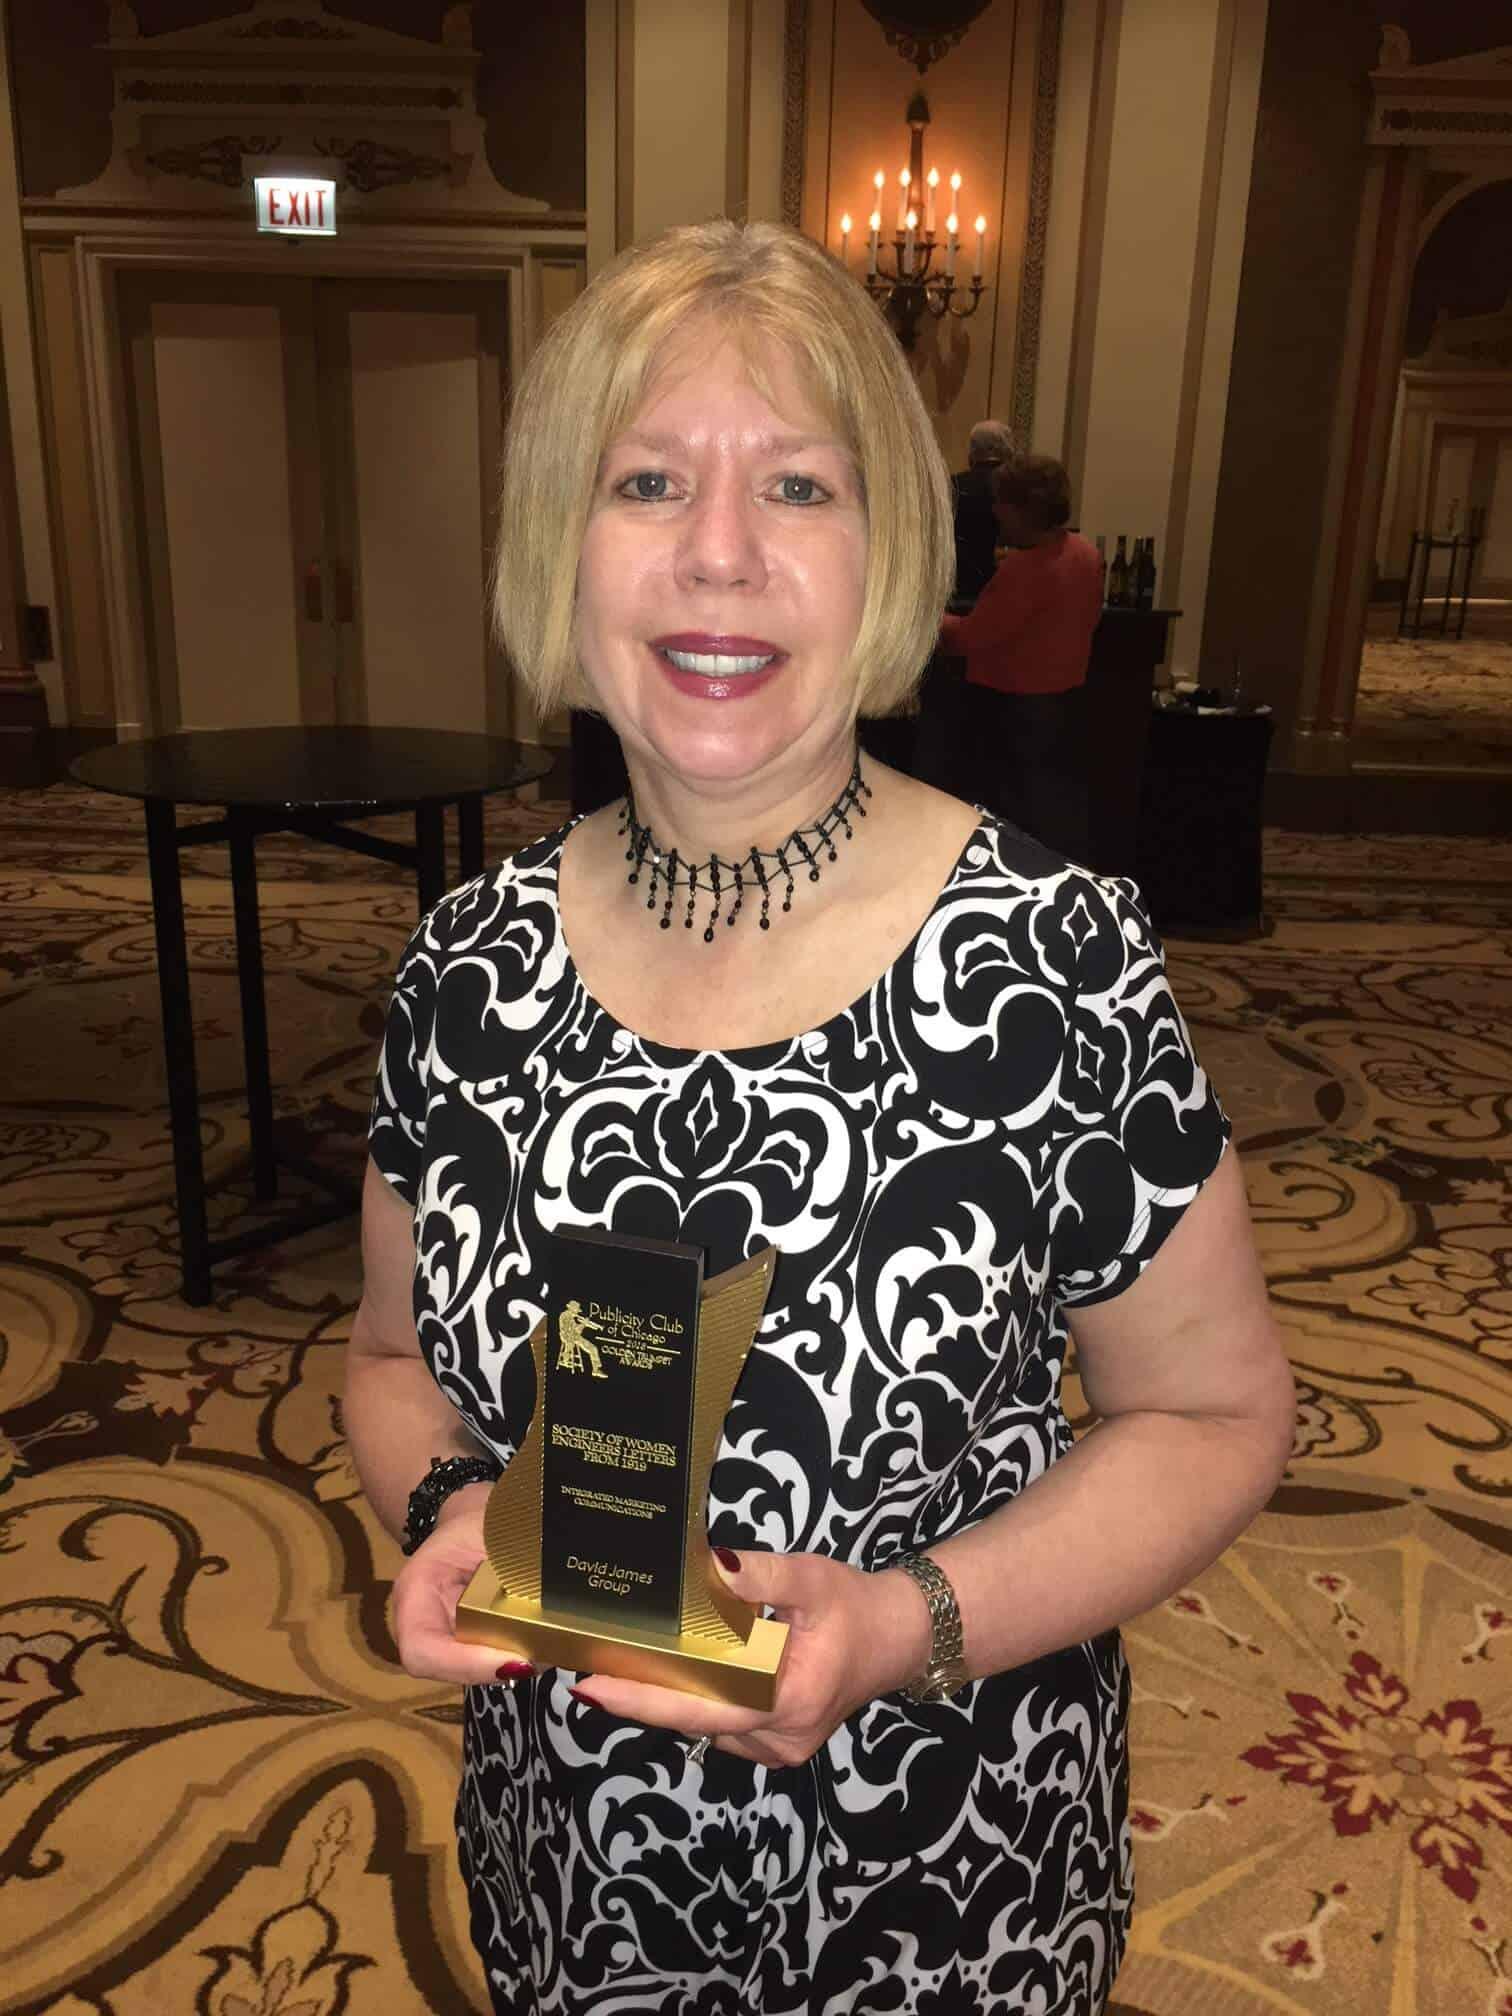 Karen Horting, SWE's CEO, receives the Golden Trumpet Award